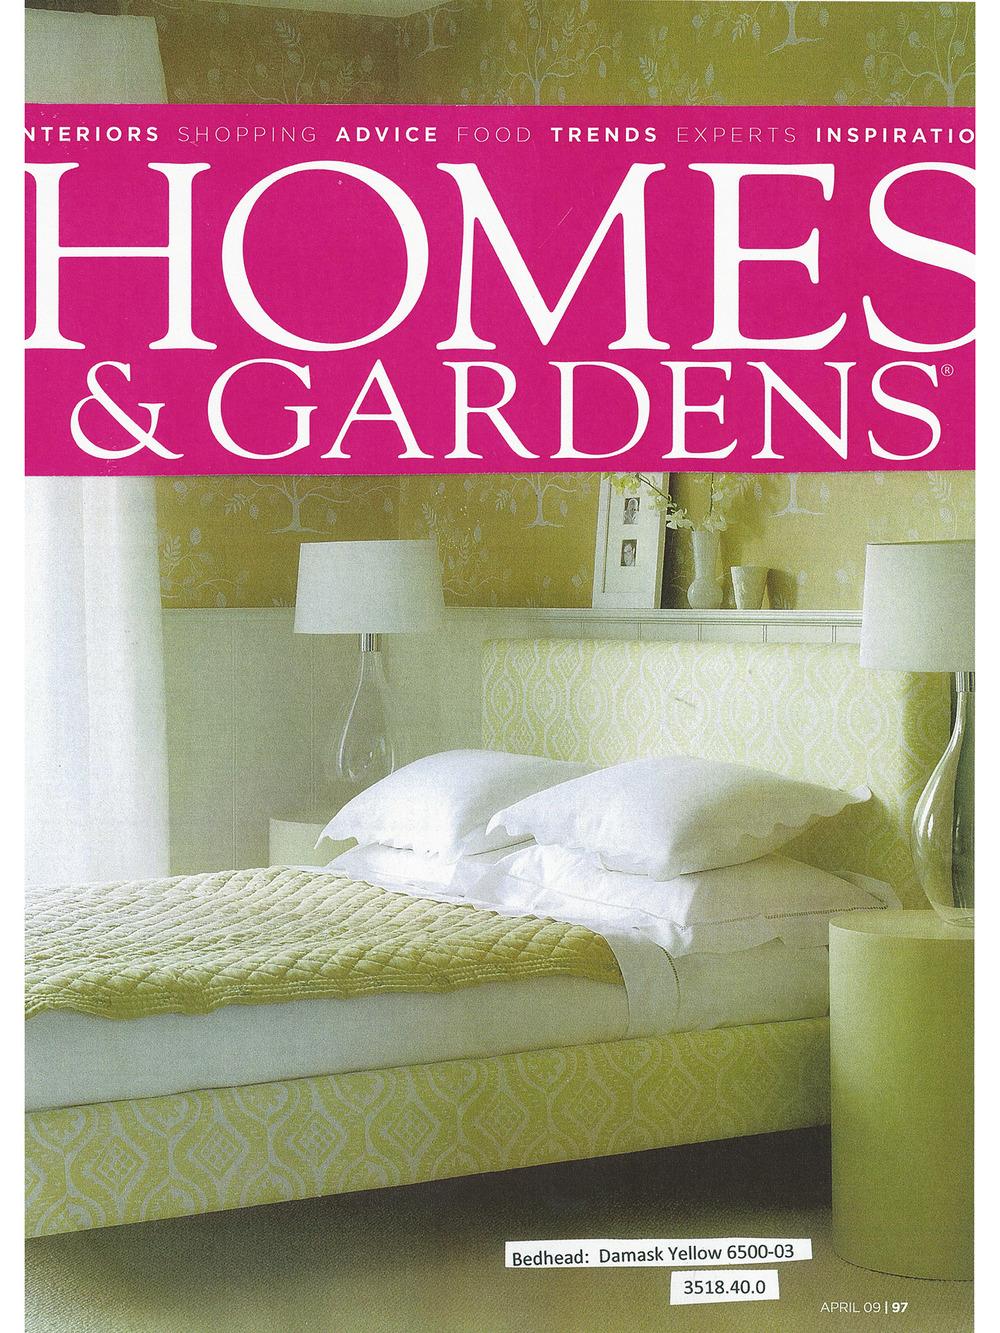 2009 April-Homes & Gardens.jpeg